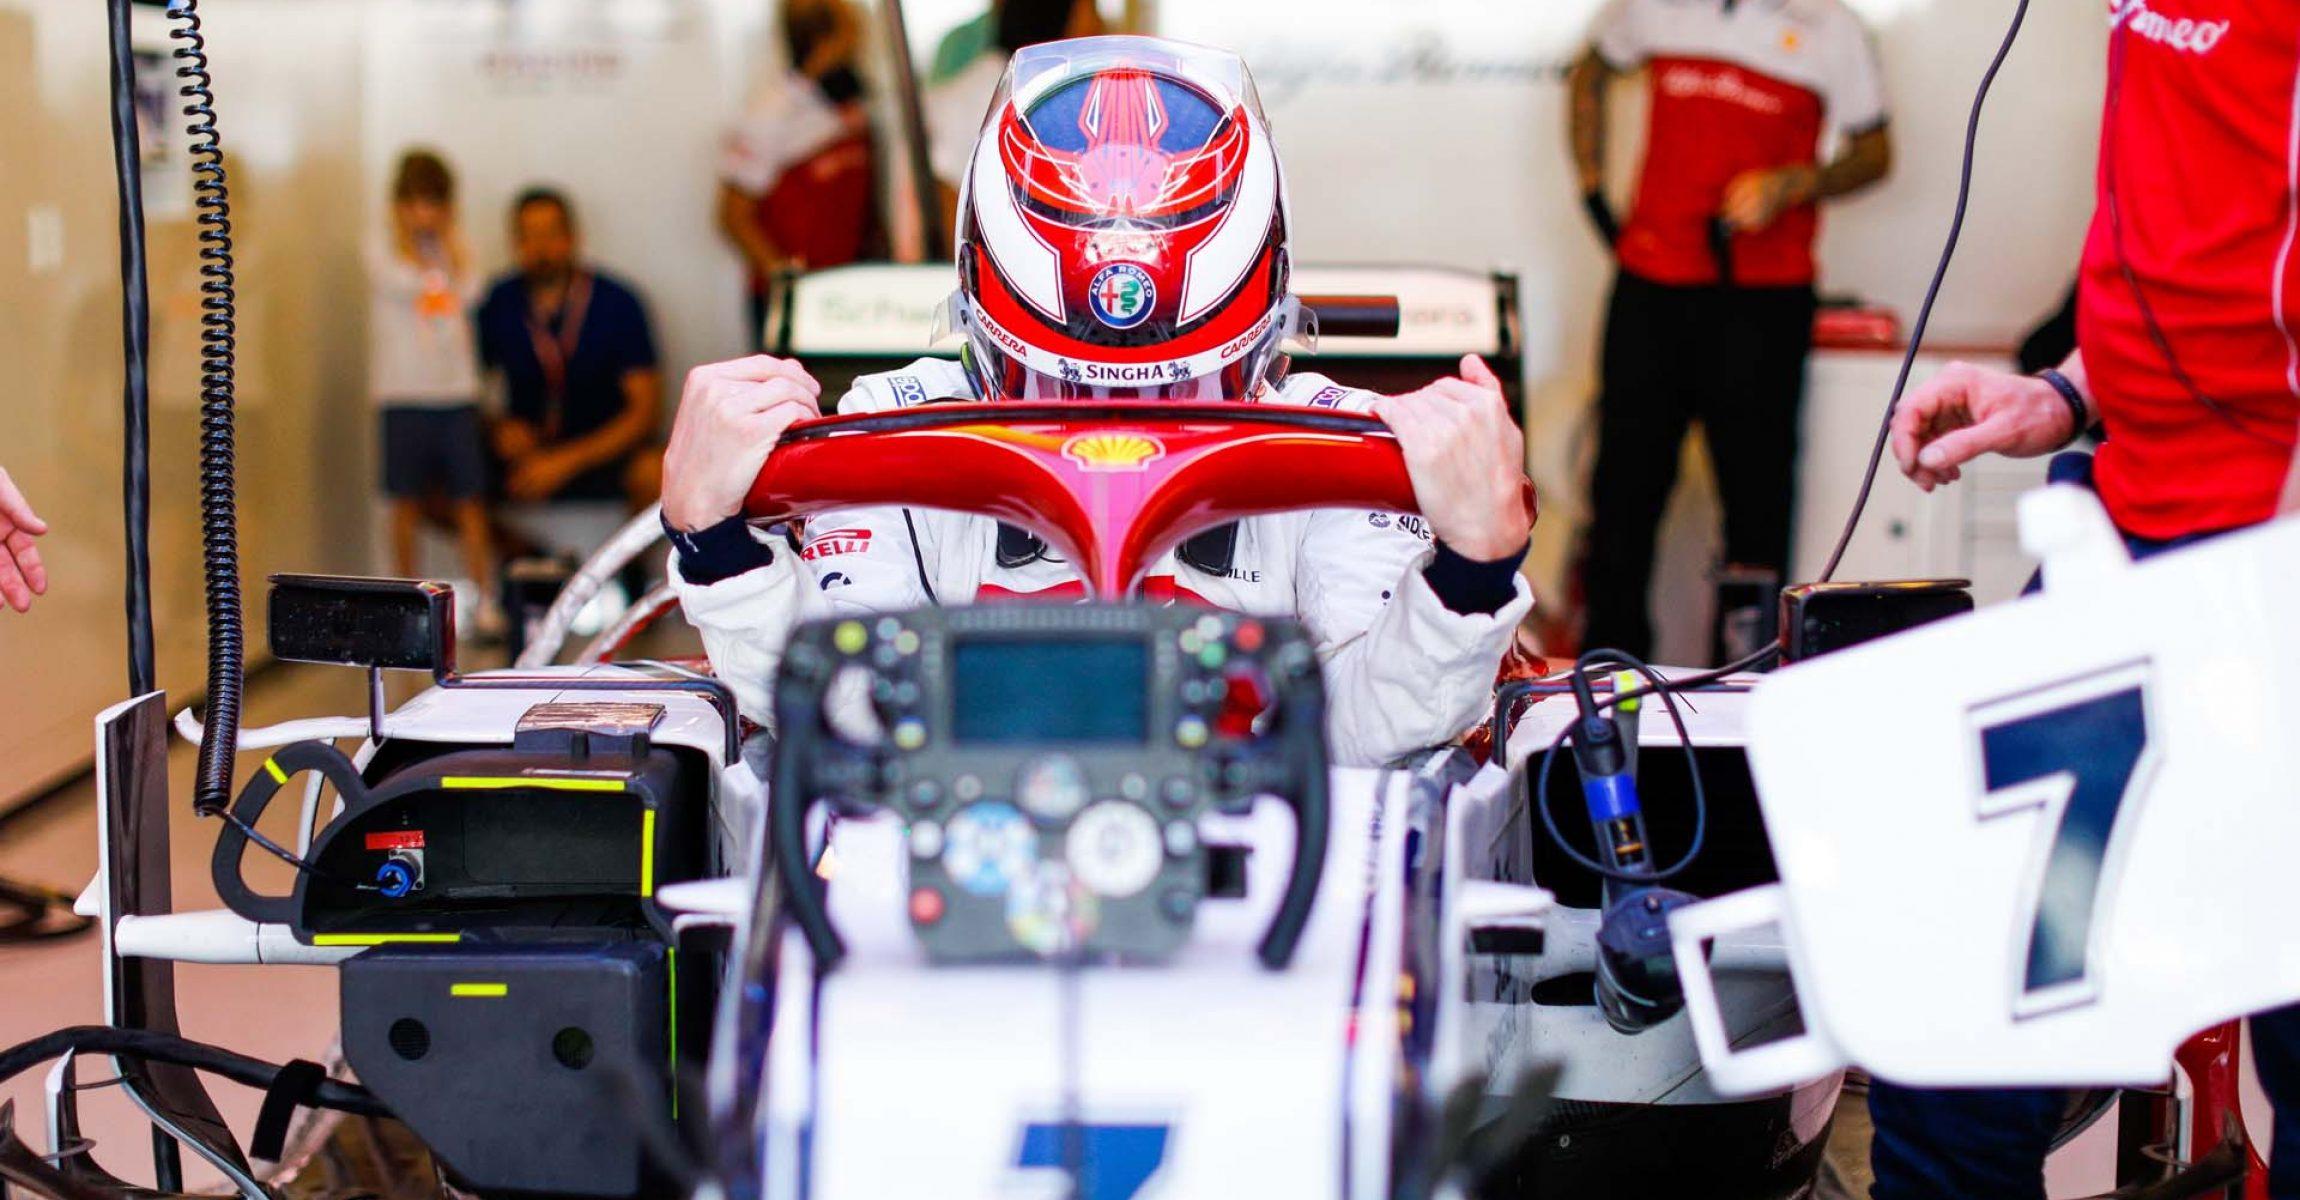 RAIKKONEN Kimi (fin), Alfa Romeo Racing C38, portrait during the 2019 Formula One World Championship, Abu Dhabi Grand Prix from November 28 to december 1 in Yas Marina - Photo Frederic Le Floc'h / DPPI